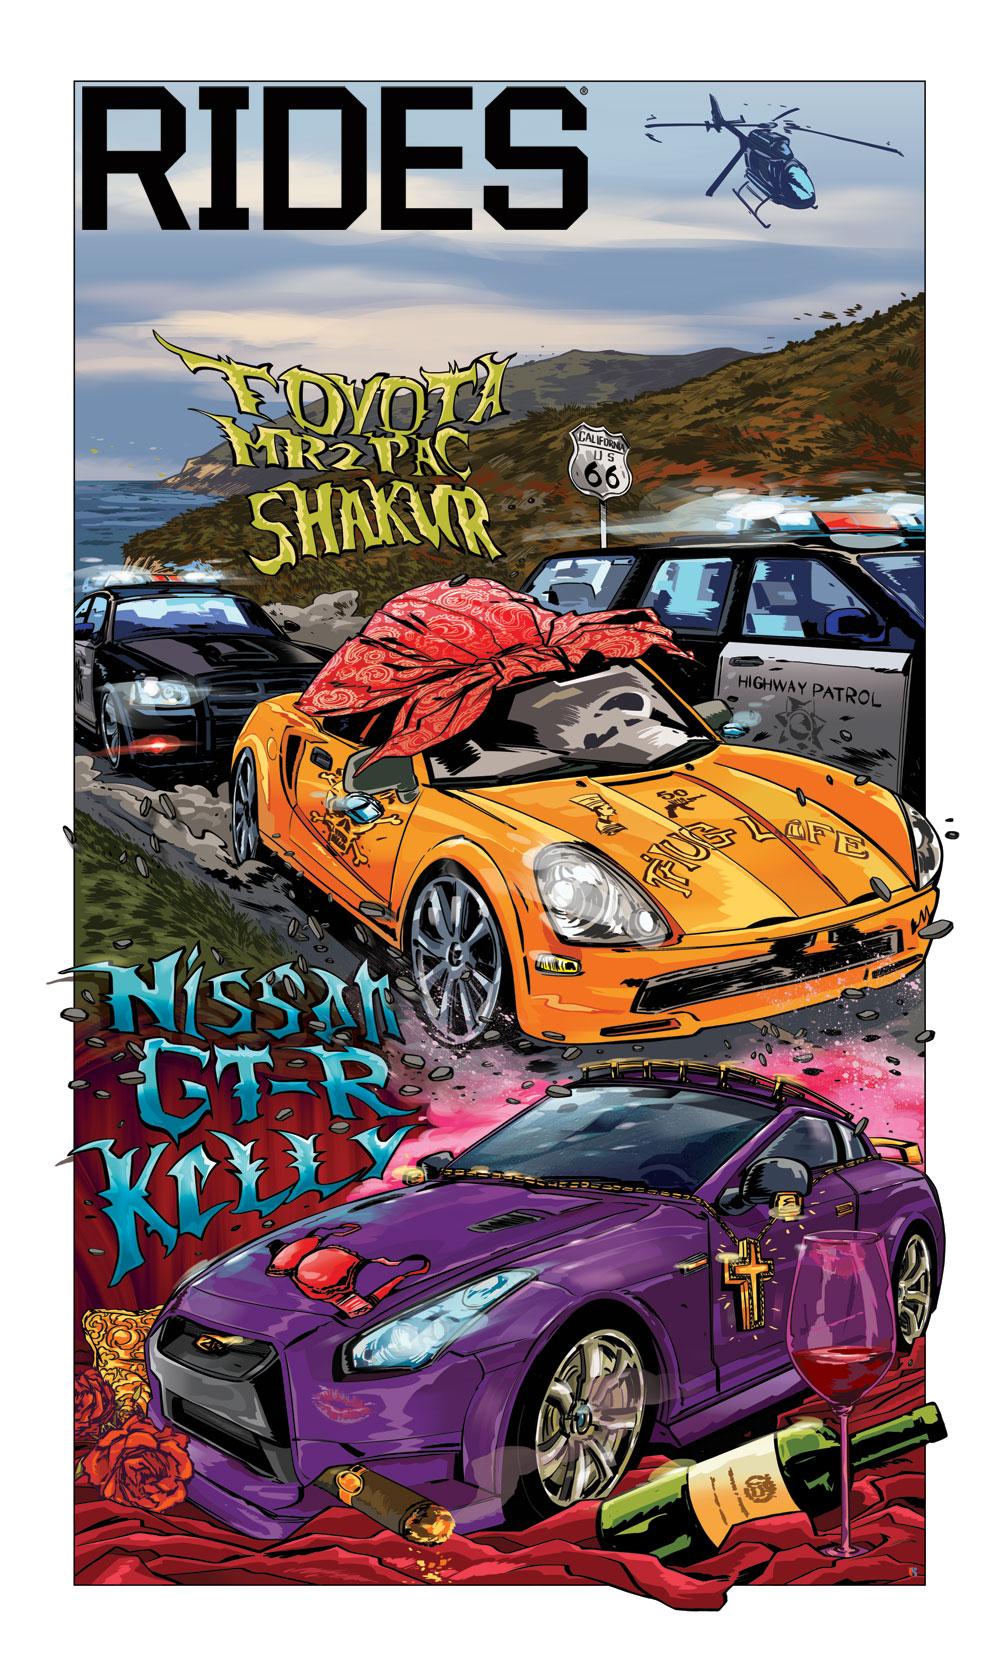 rides cars cartoon car toon mash box r kelly tupac 2pac shakur tyota mr2 nissan gt-r